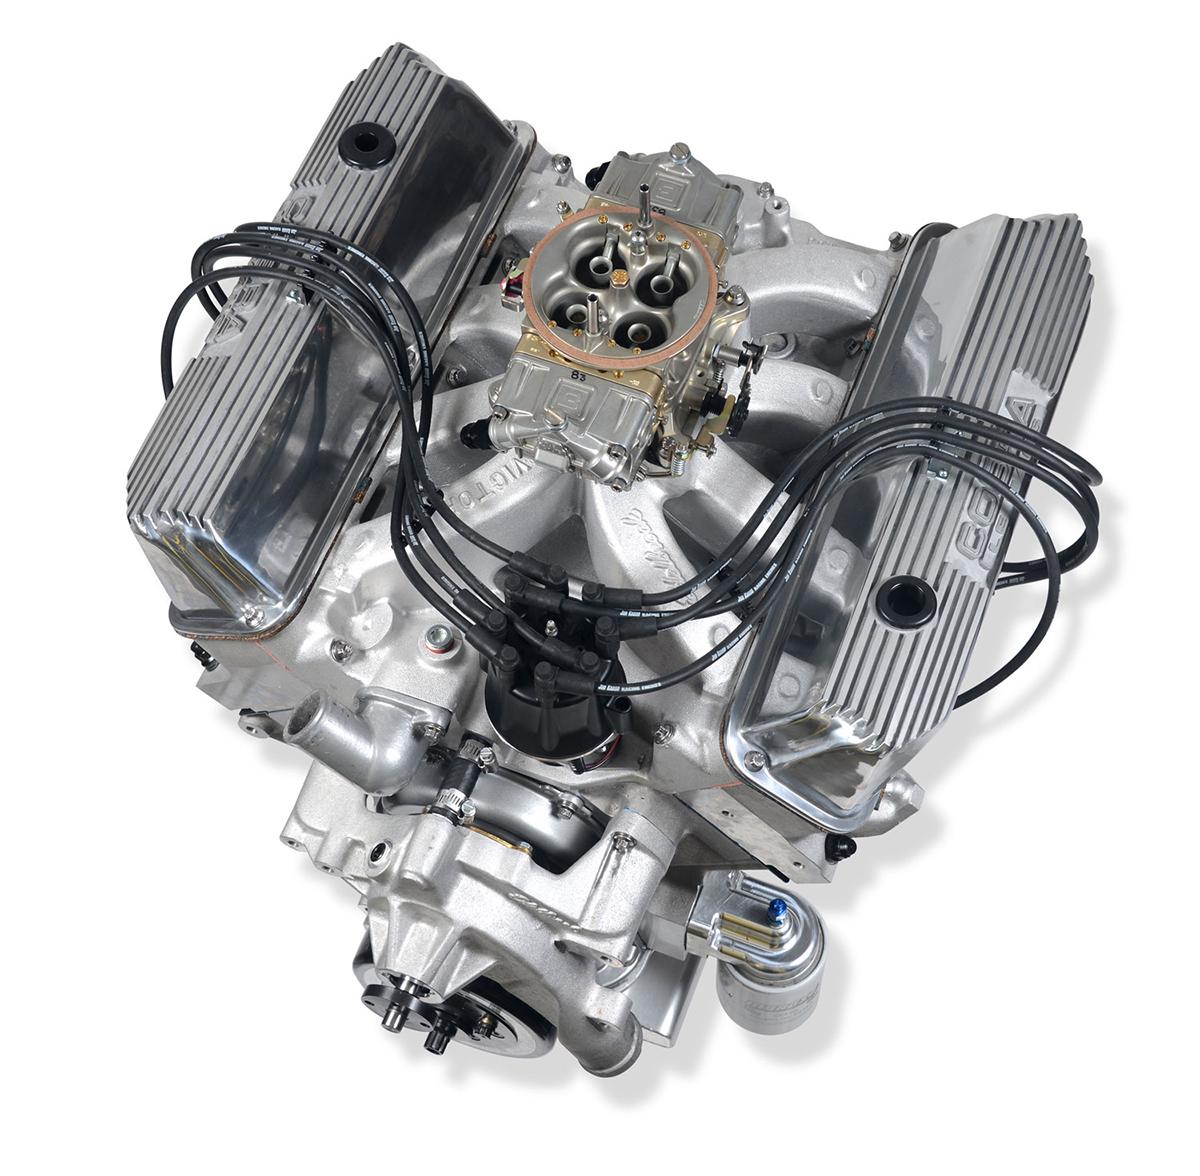 Kaase Bbf Fe Jon Kaase Racing Engines